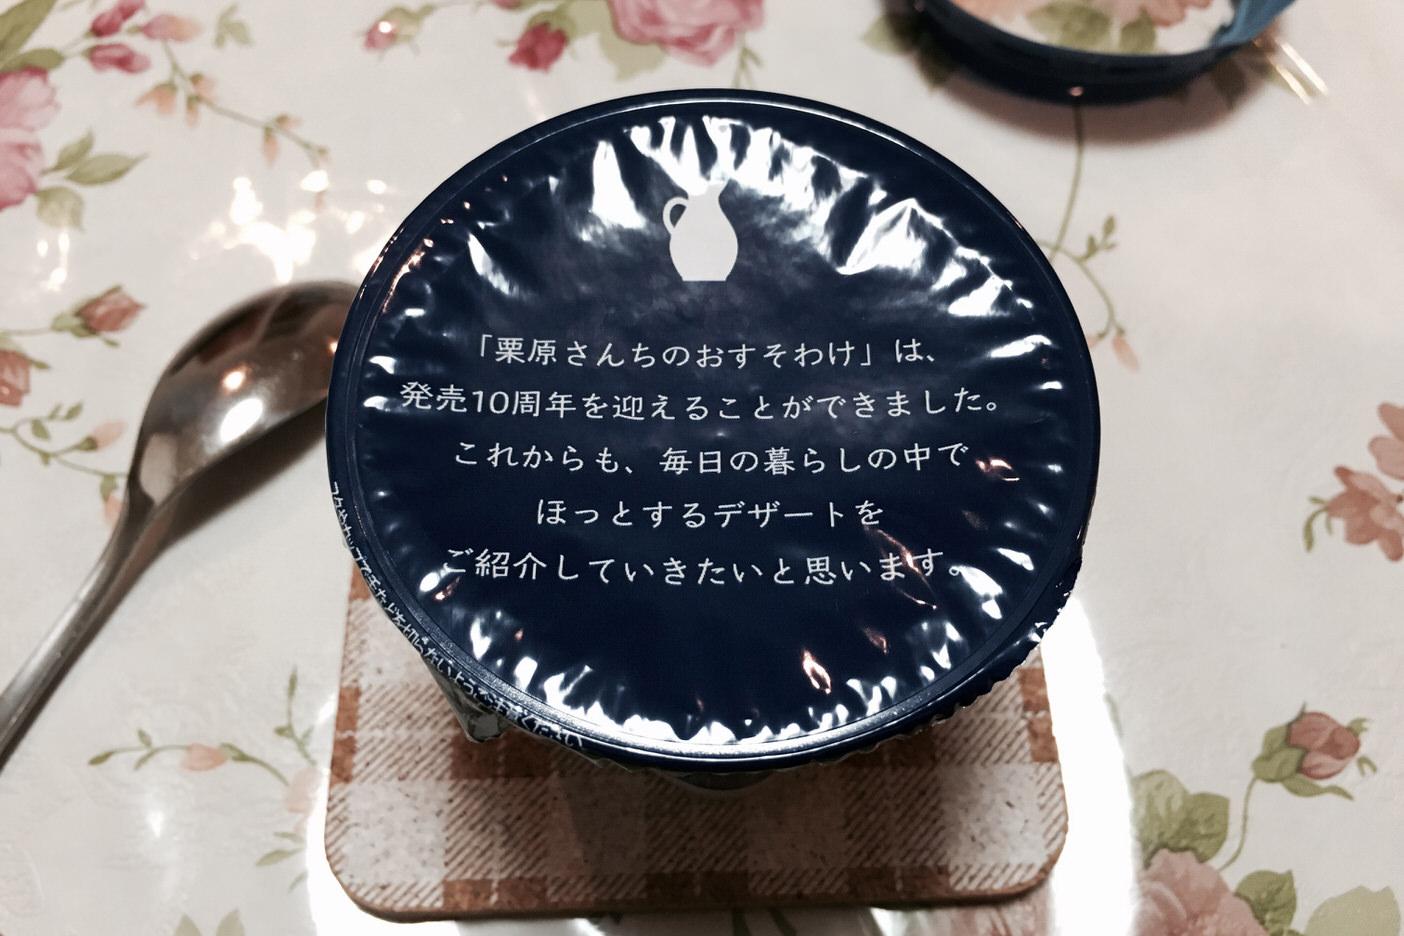 Kurihara harumi pannacotta 005